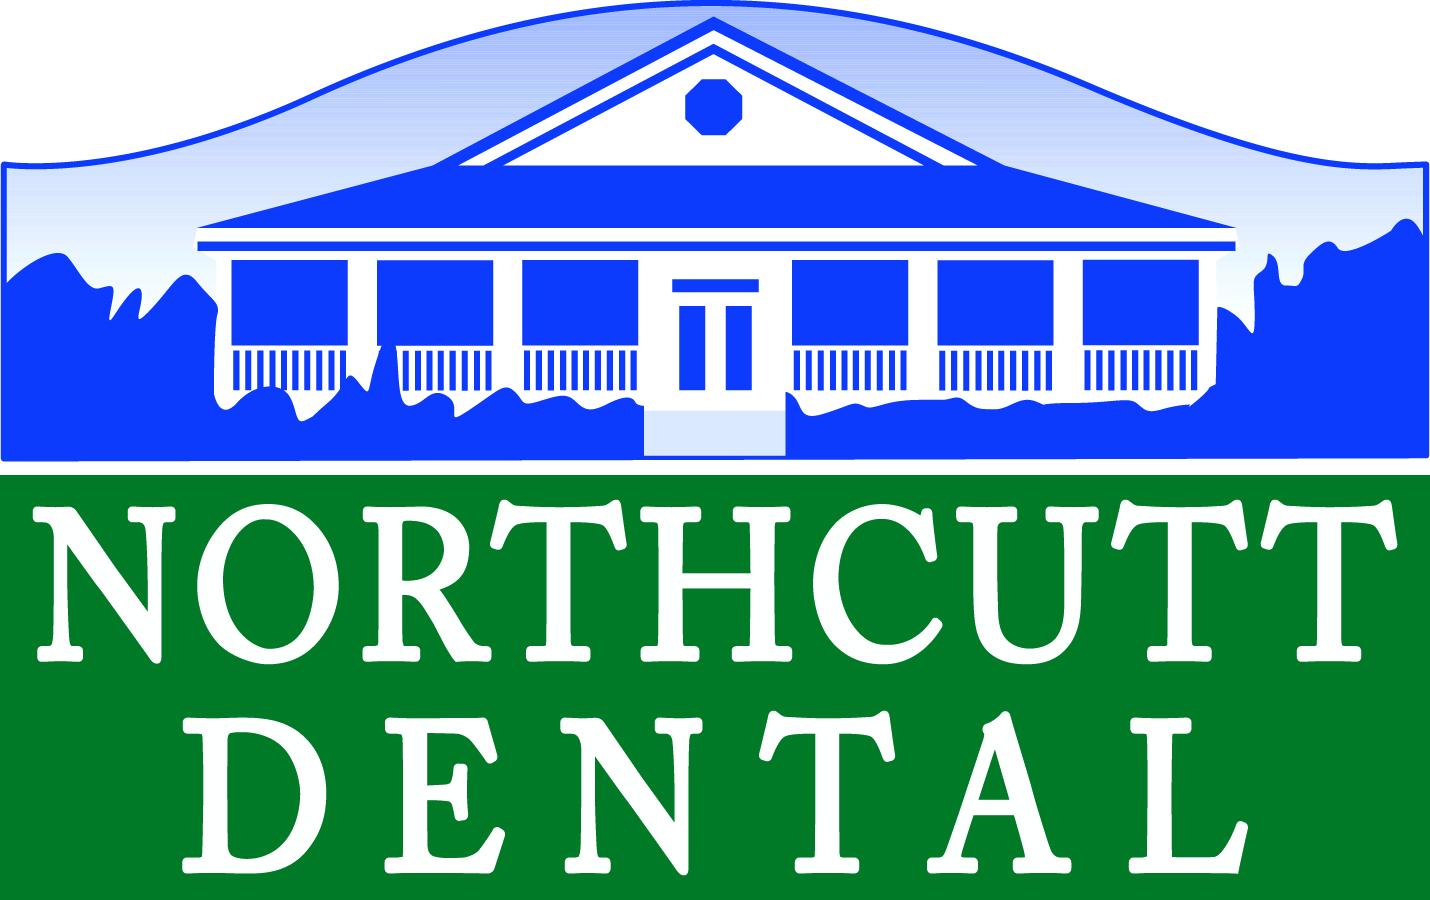 Northcutt Dental